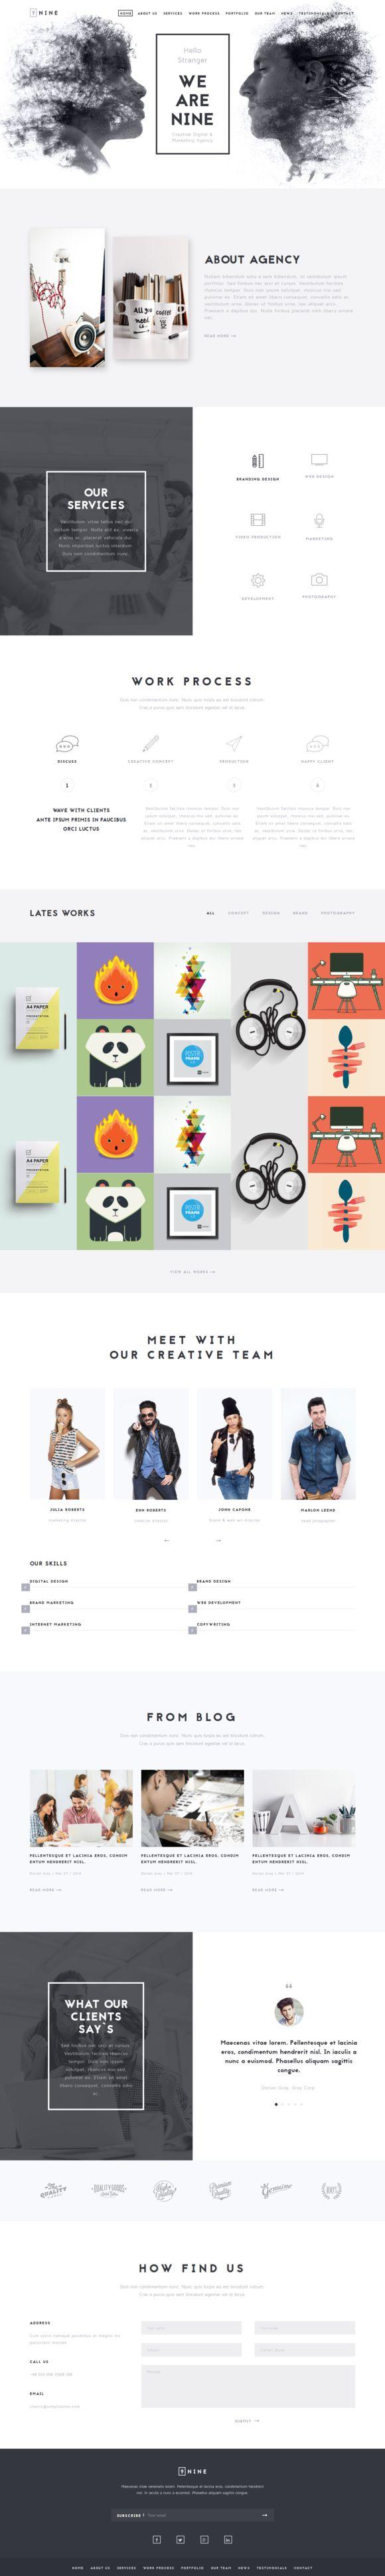 Best 25+ Page template ideas on Pinterest | Free portfolio website ...